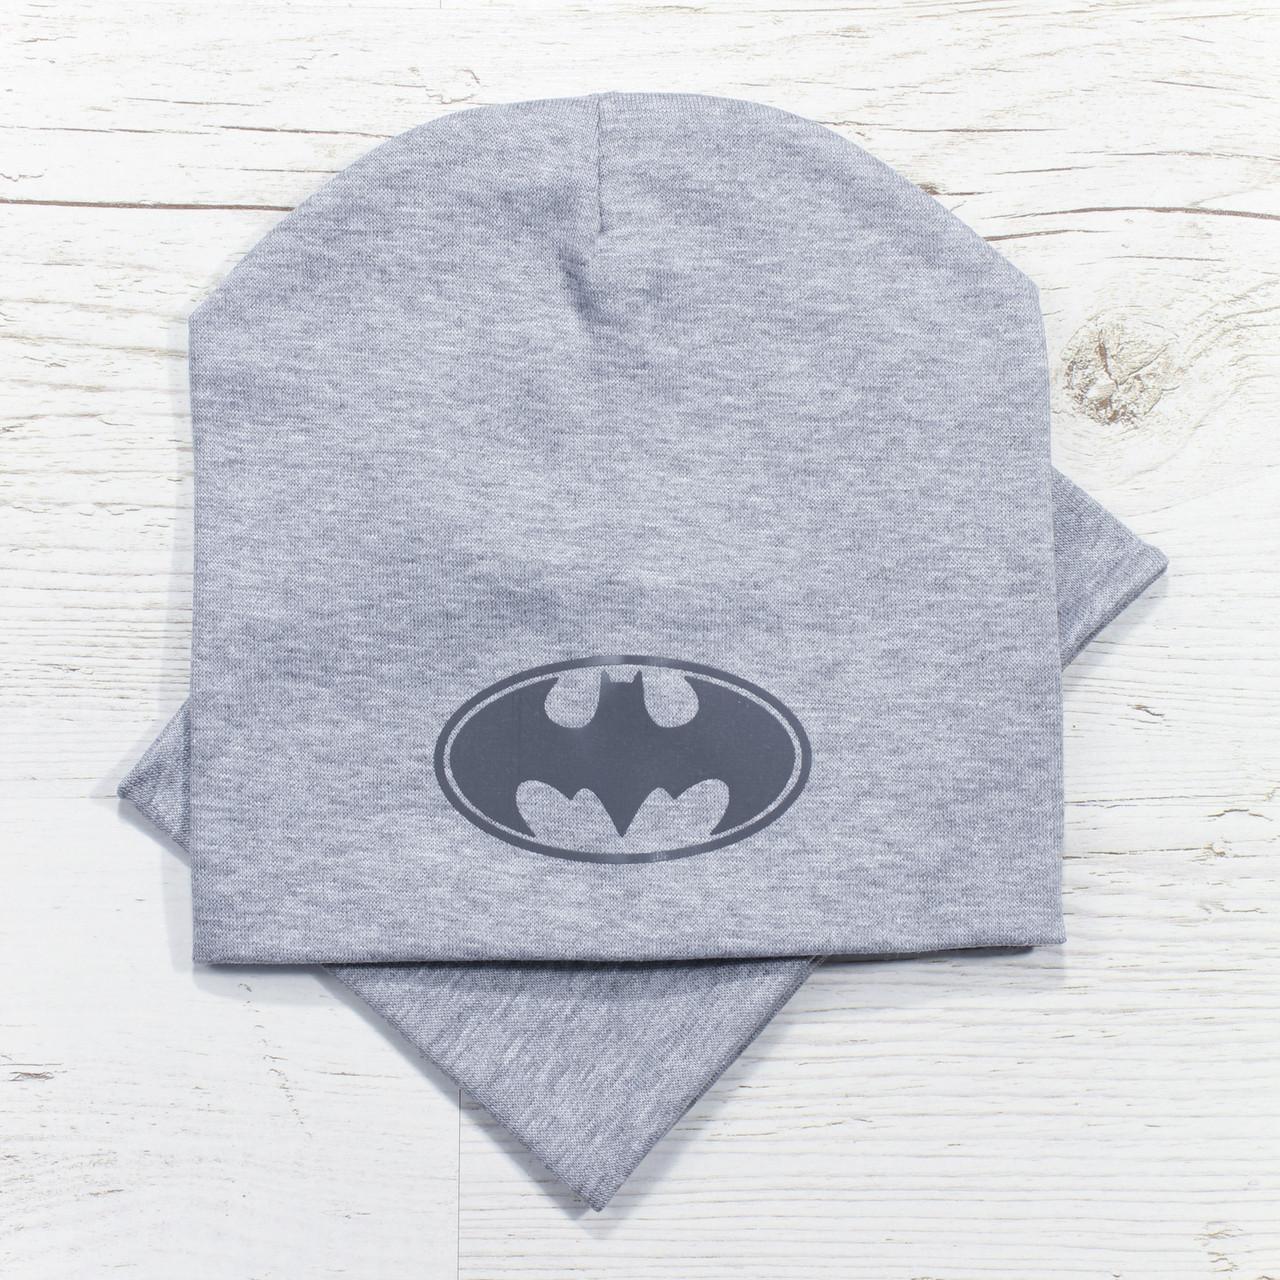 Демисезонная Batman Комплект шапка + баф серый меланж 48-52р.